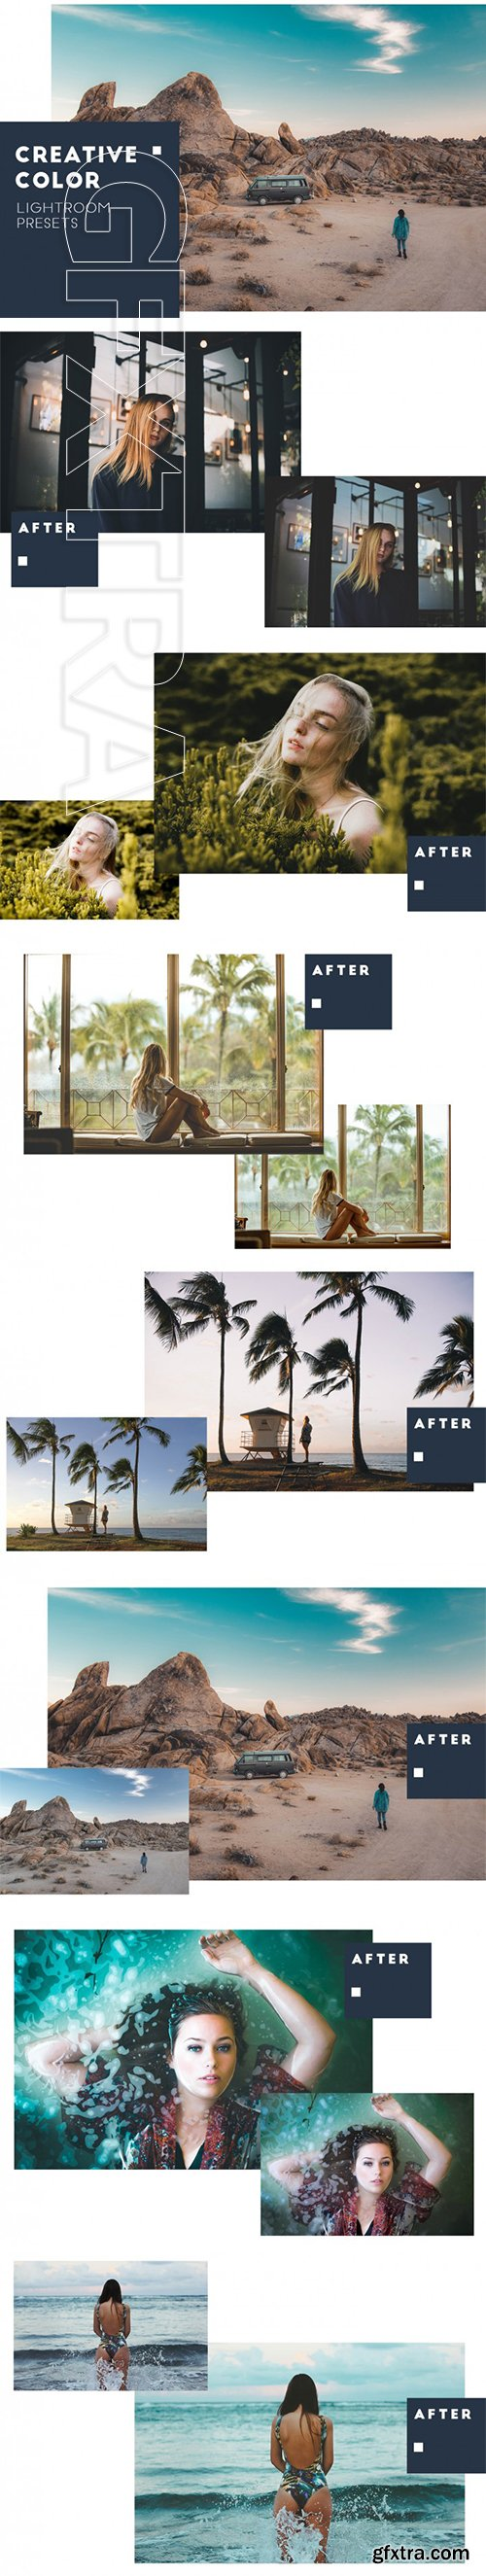 Creative color Lightroom presets